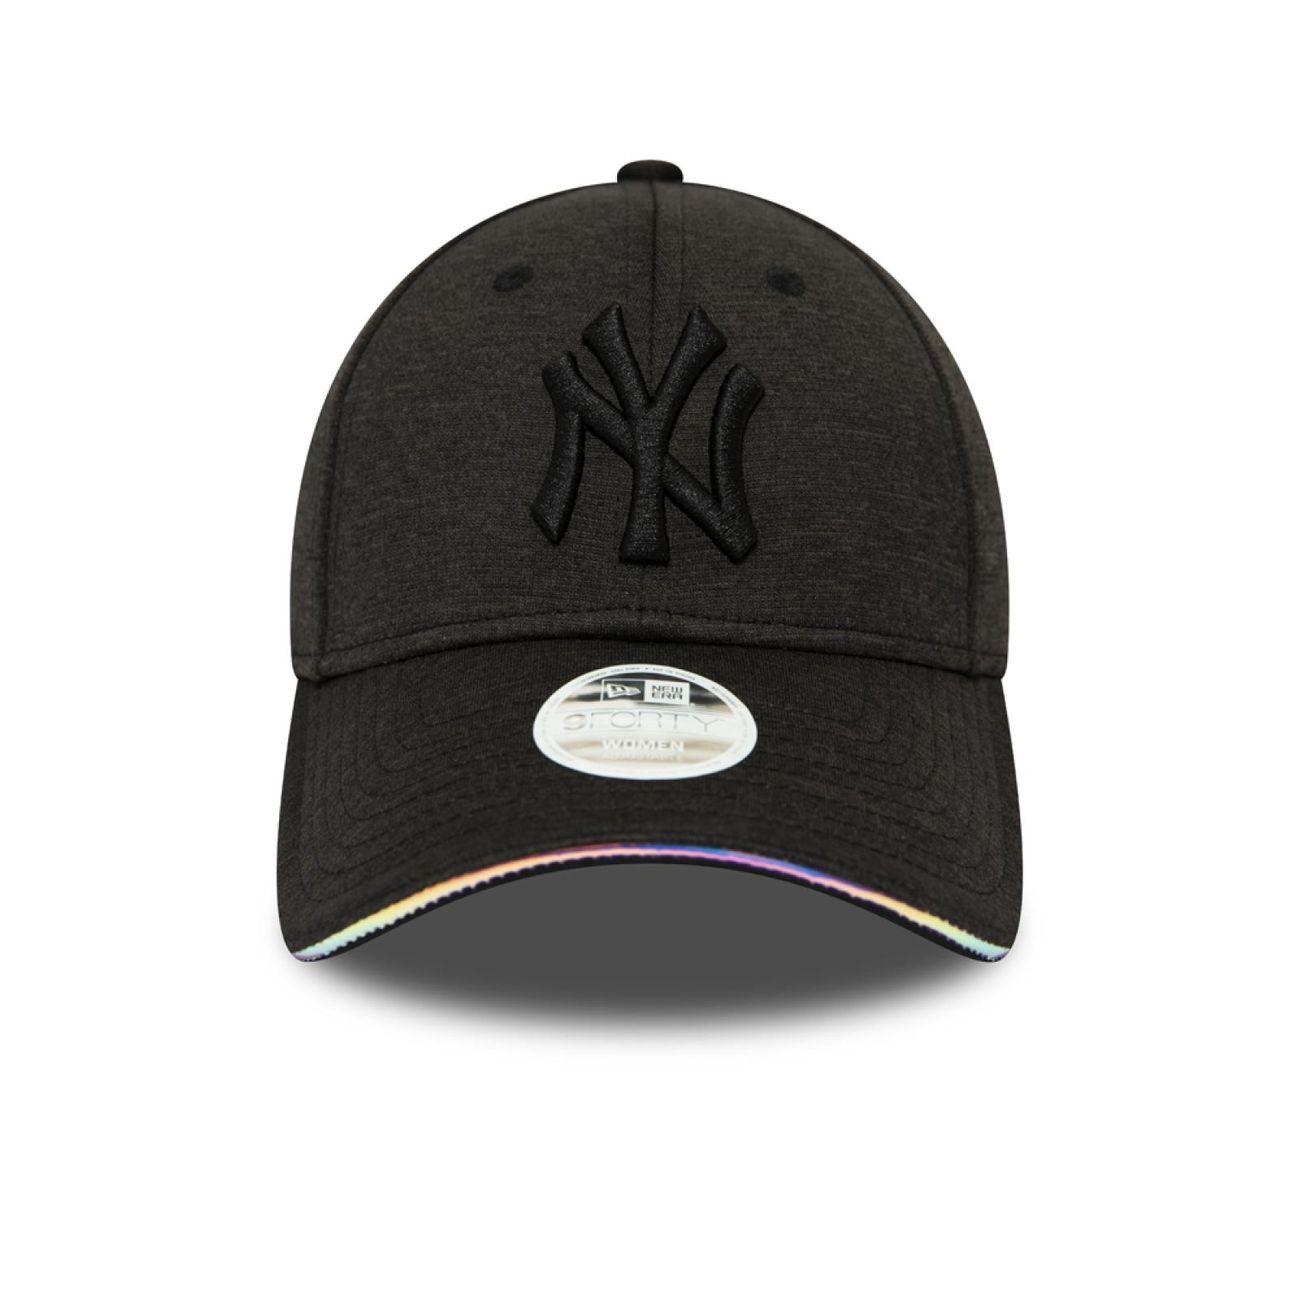 Mode- Lifestyle femme NEW ERA Casquette New Era NY Yankees Iridescent Lining 9Forty - 12285220